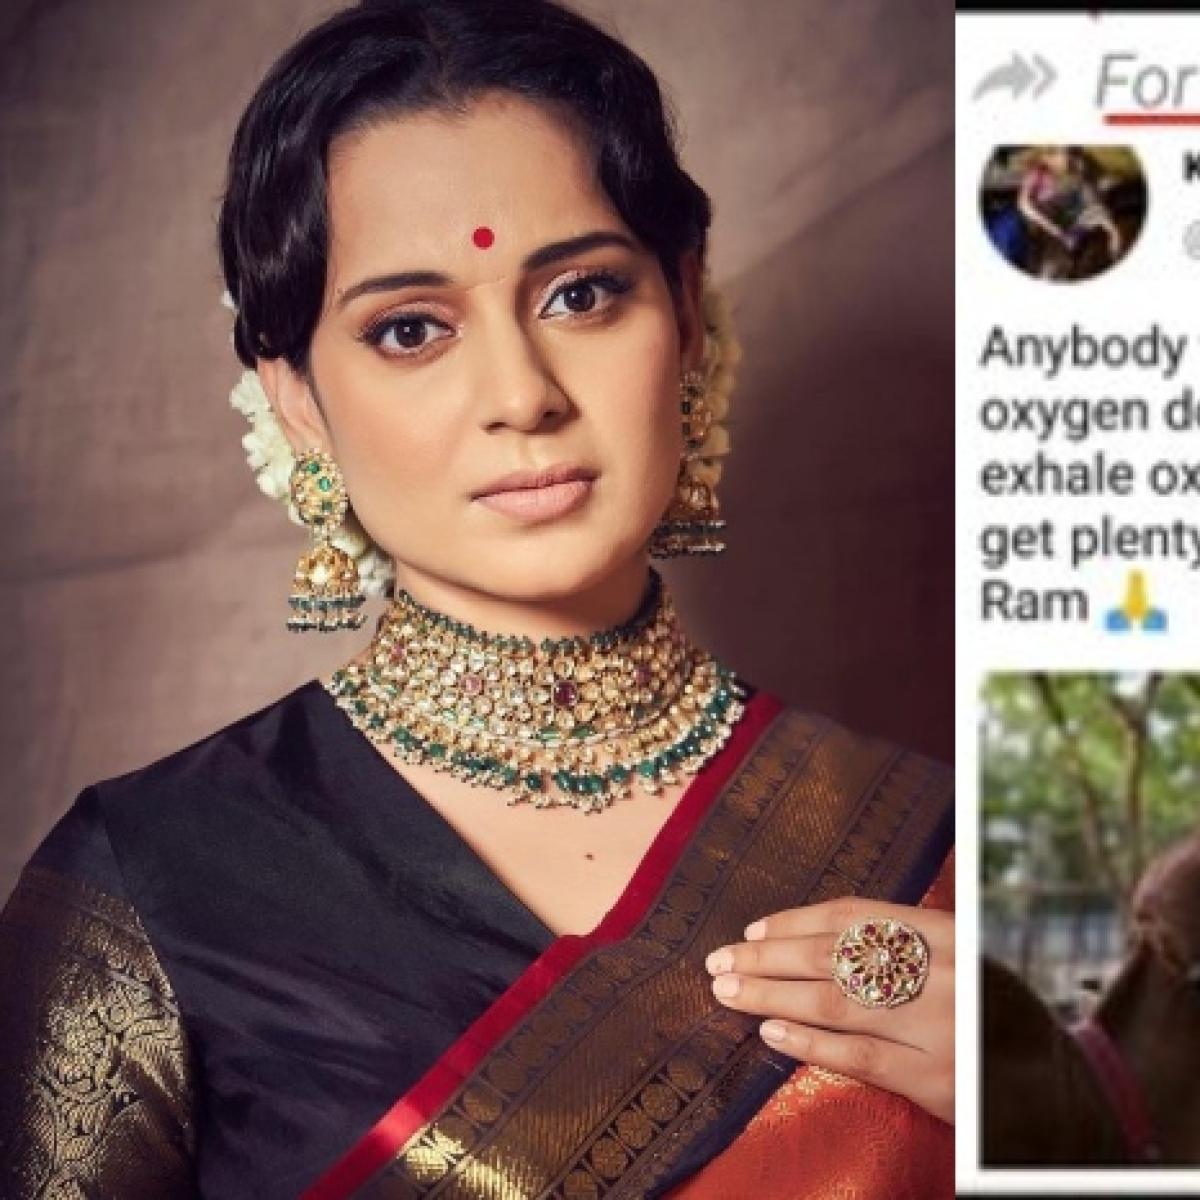 Kangana Ranaut lambasts those sharing fake tweets, says 'reminds me of one of Modi ji's campaigns'